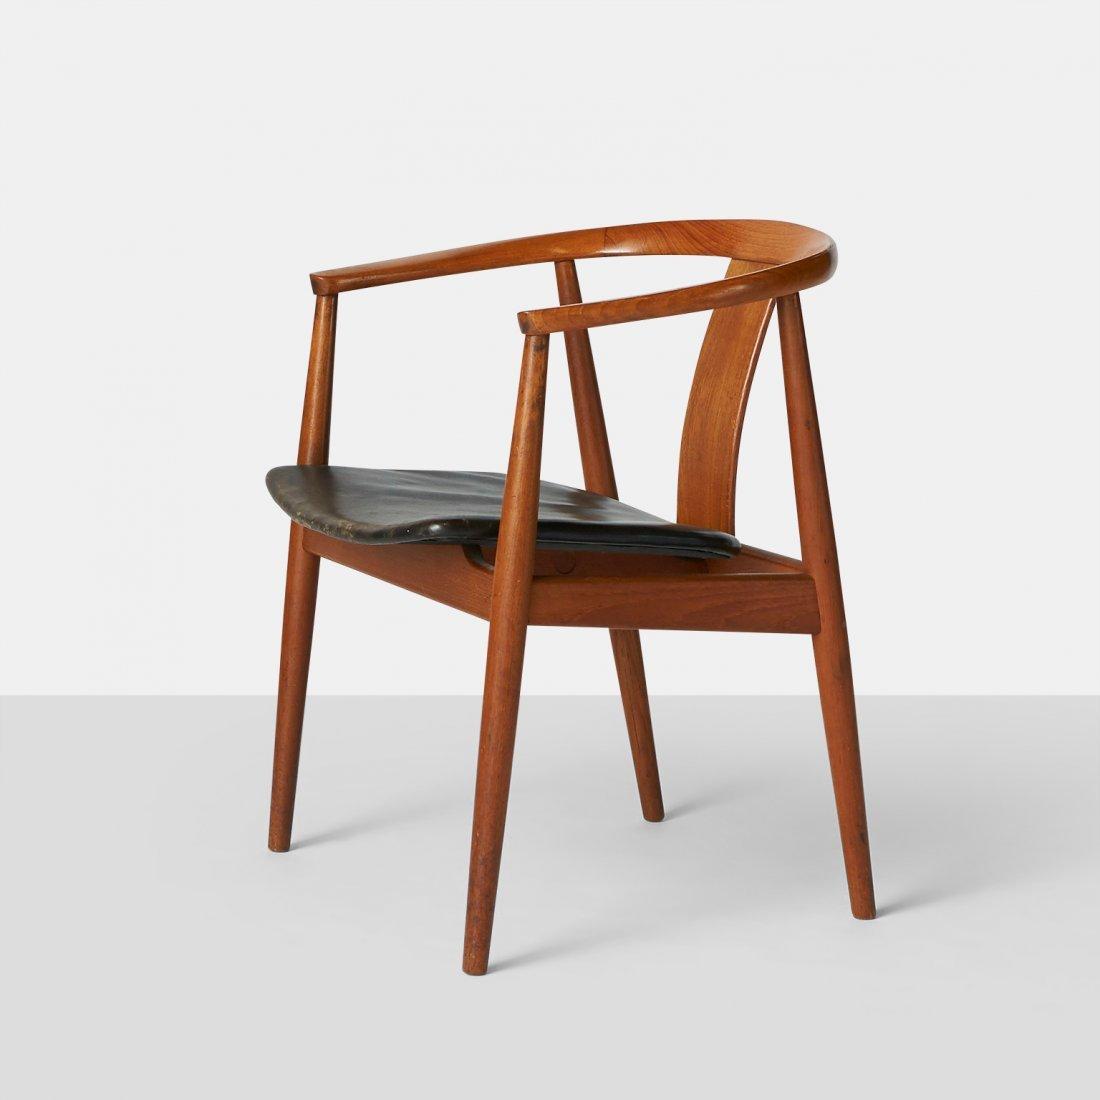 Tove & Edvard Kindt-Larsen, Lounge Chair